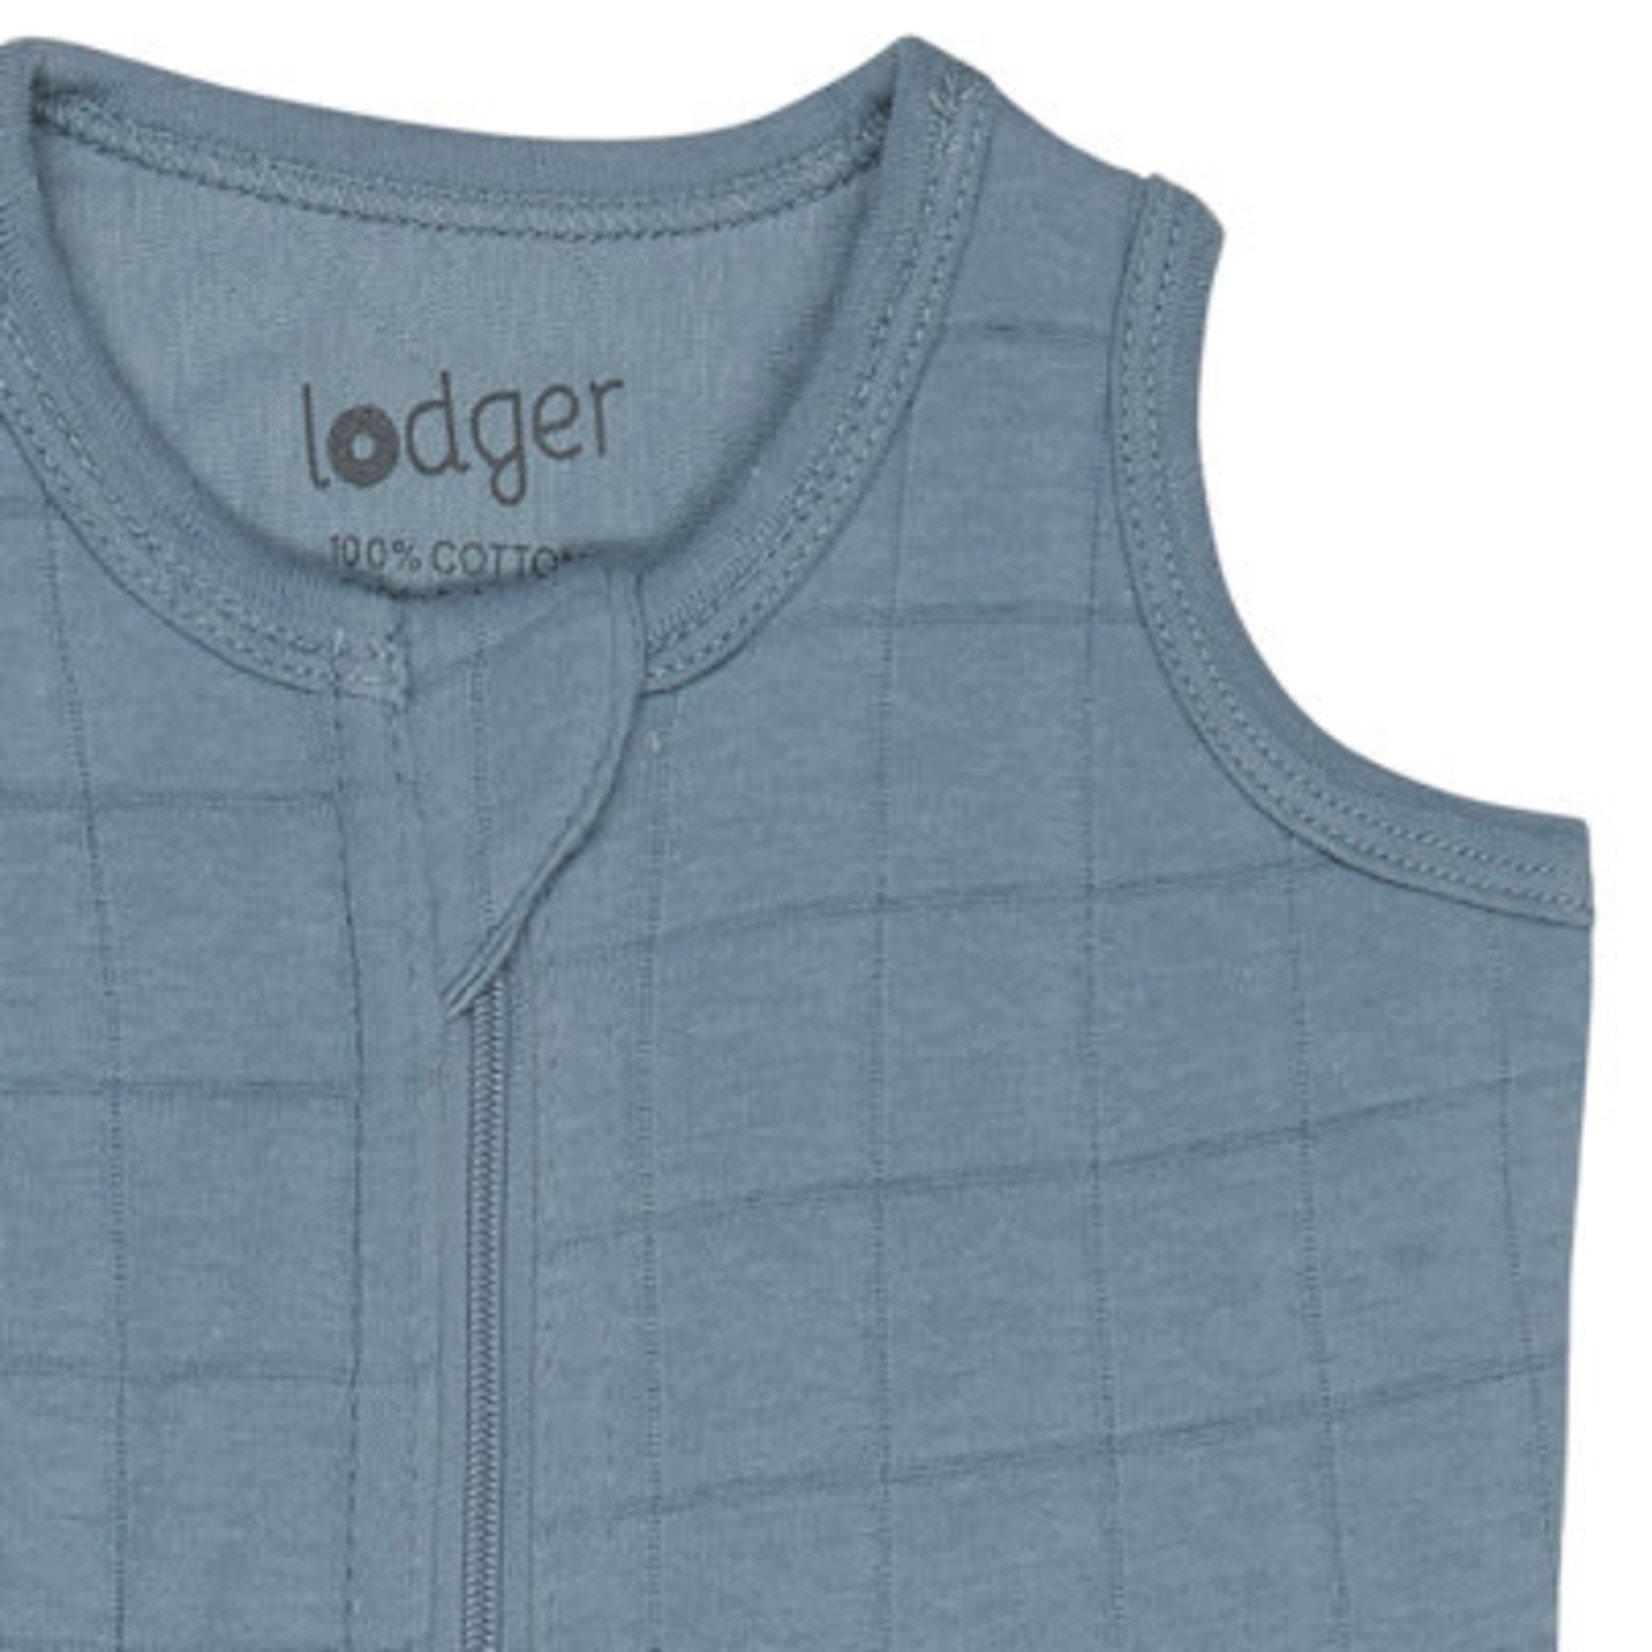 Lodger Slaapzak Zomer (mouwloos) Solid Mt 86/98